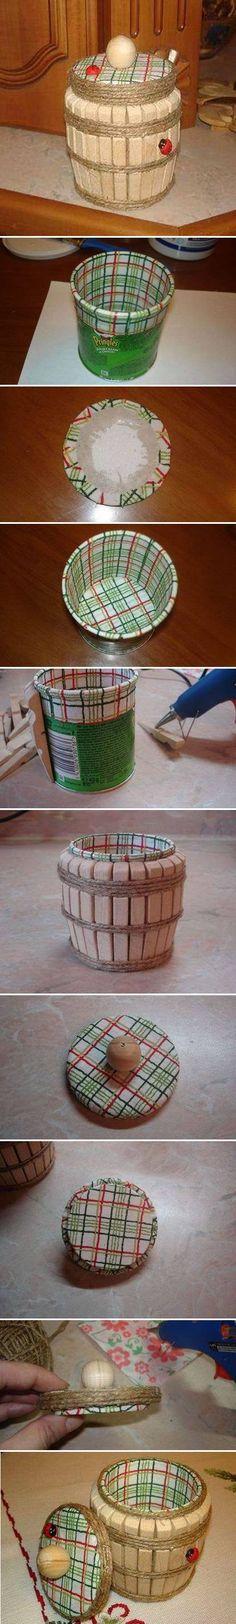 DIY Clothespin Barrel Follow Us on Facebook -->> http://www.facebook.com/UsefulDiy